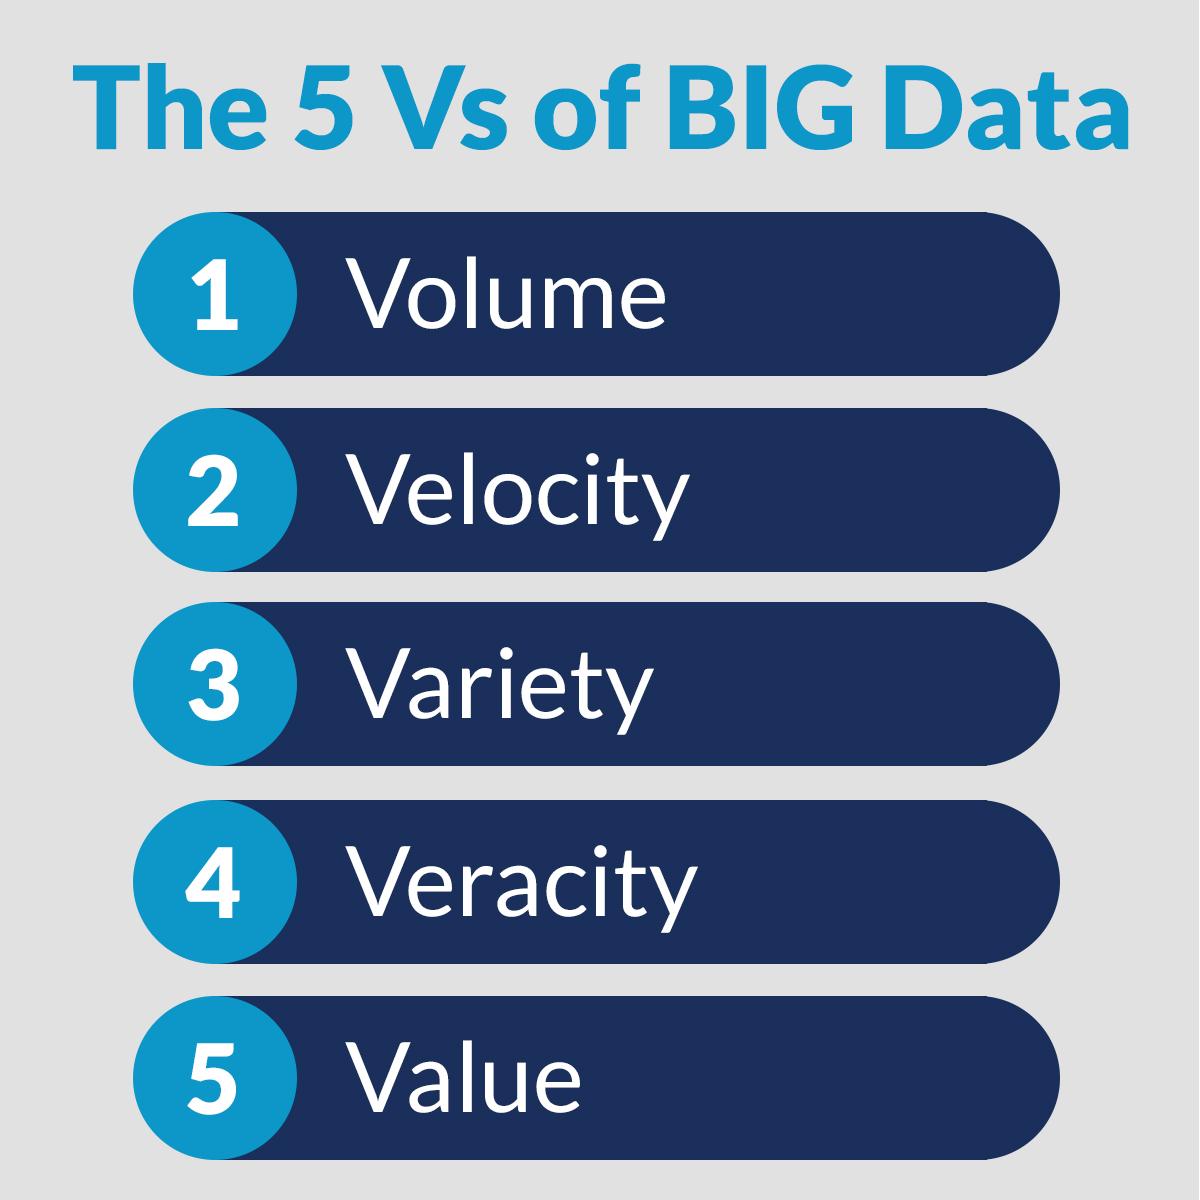 The 5 Vs of Big Data